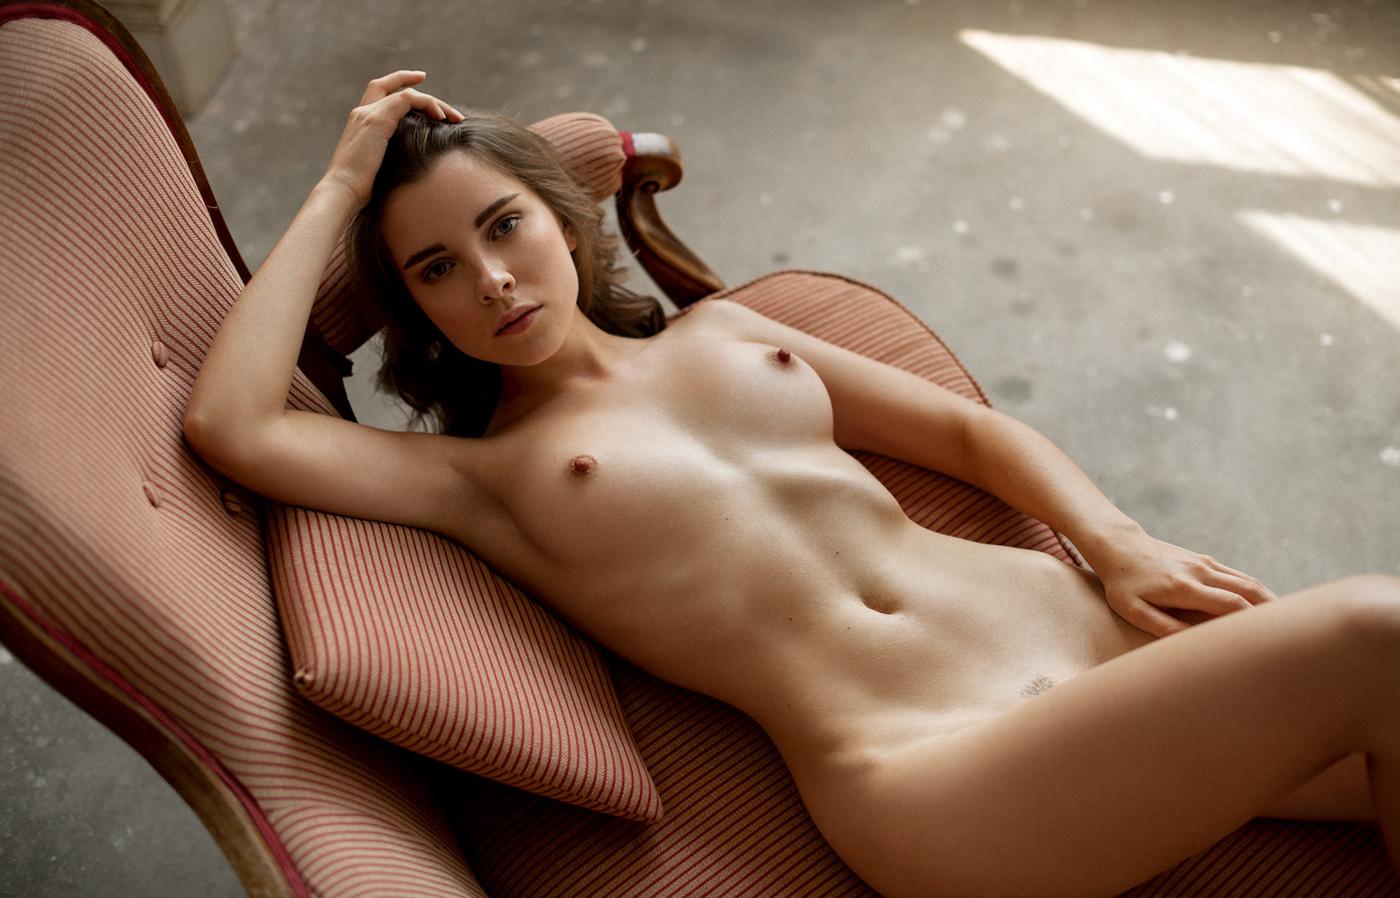 Showroom / фотограф Sacha Leyendecker - модель Катерина Марченко